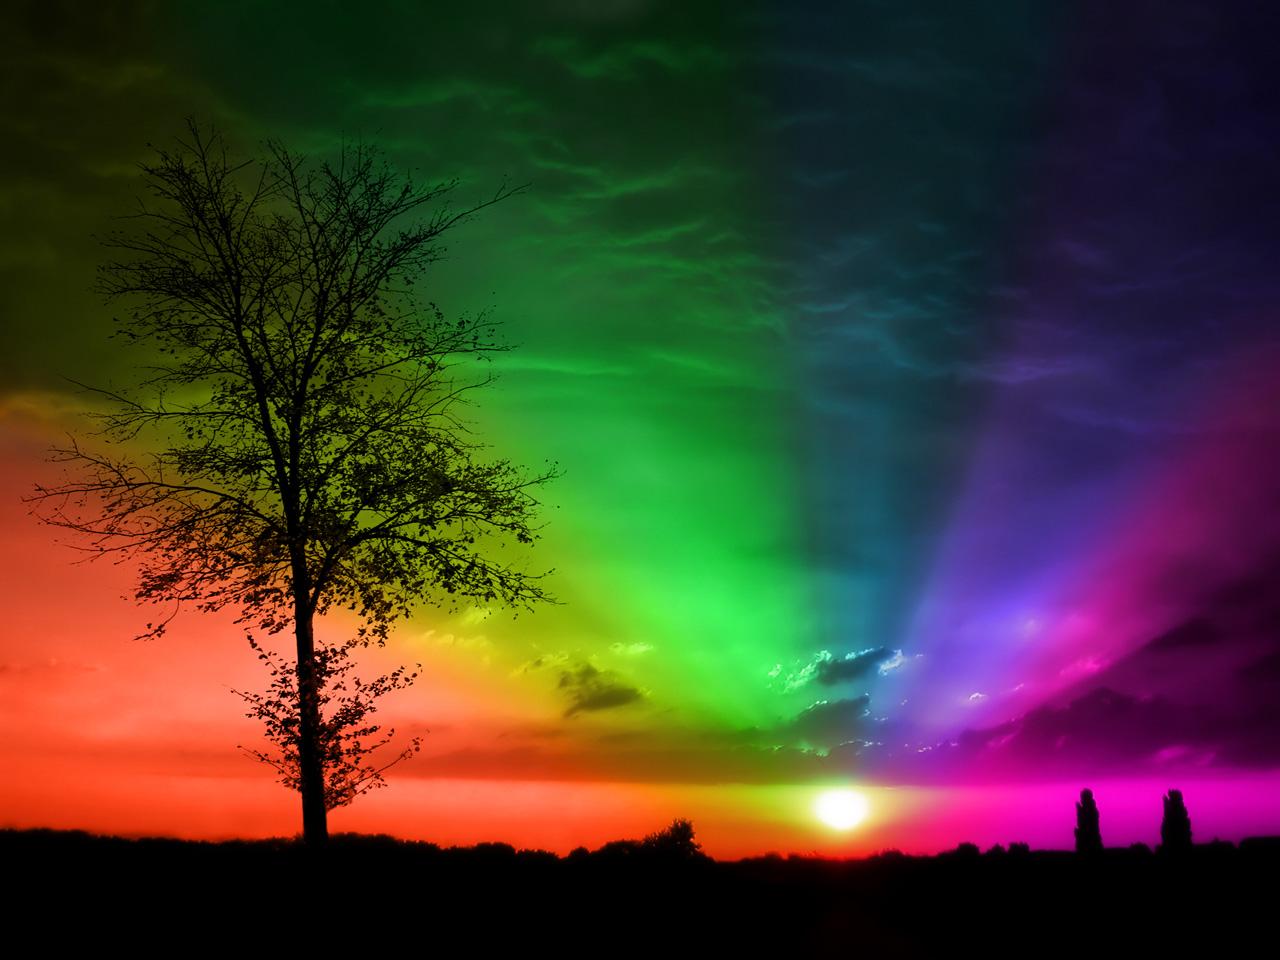 Rainbow Wallpapers HD, Art Rainbow Wallpapers Hd, #12882